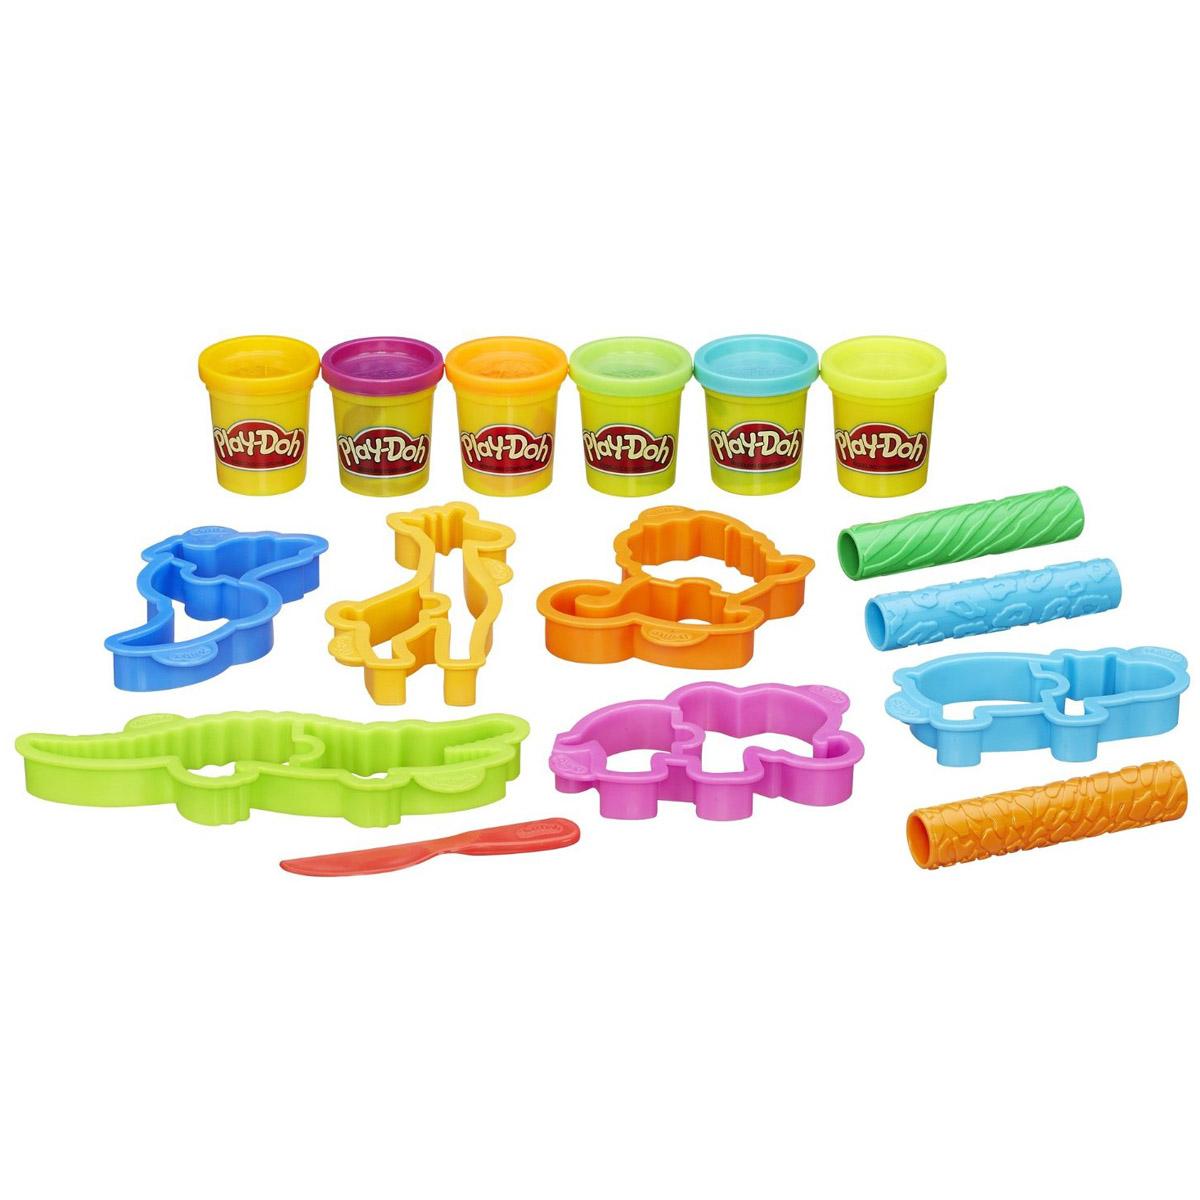 ������� ����� Play-Doh ������� ������